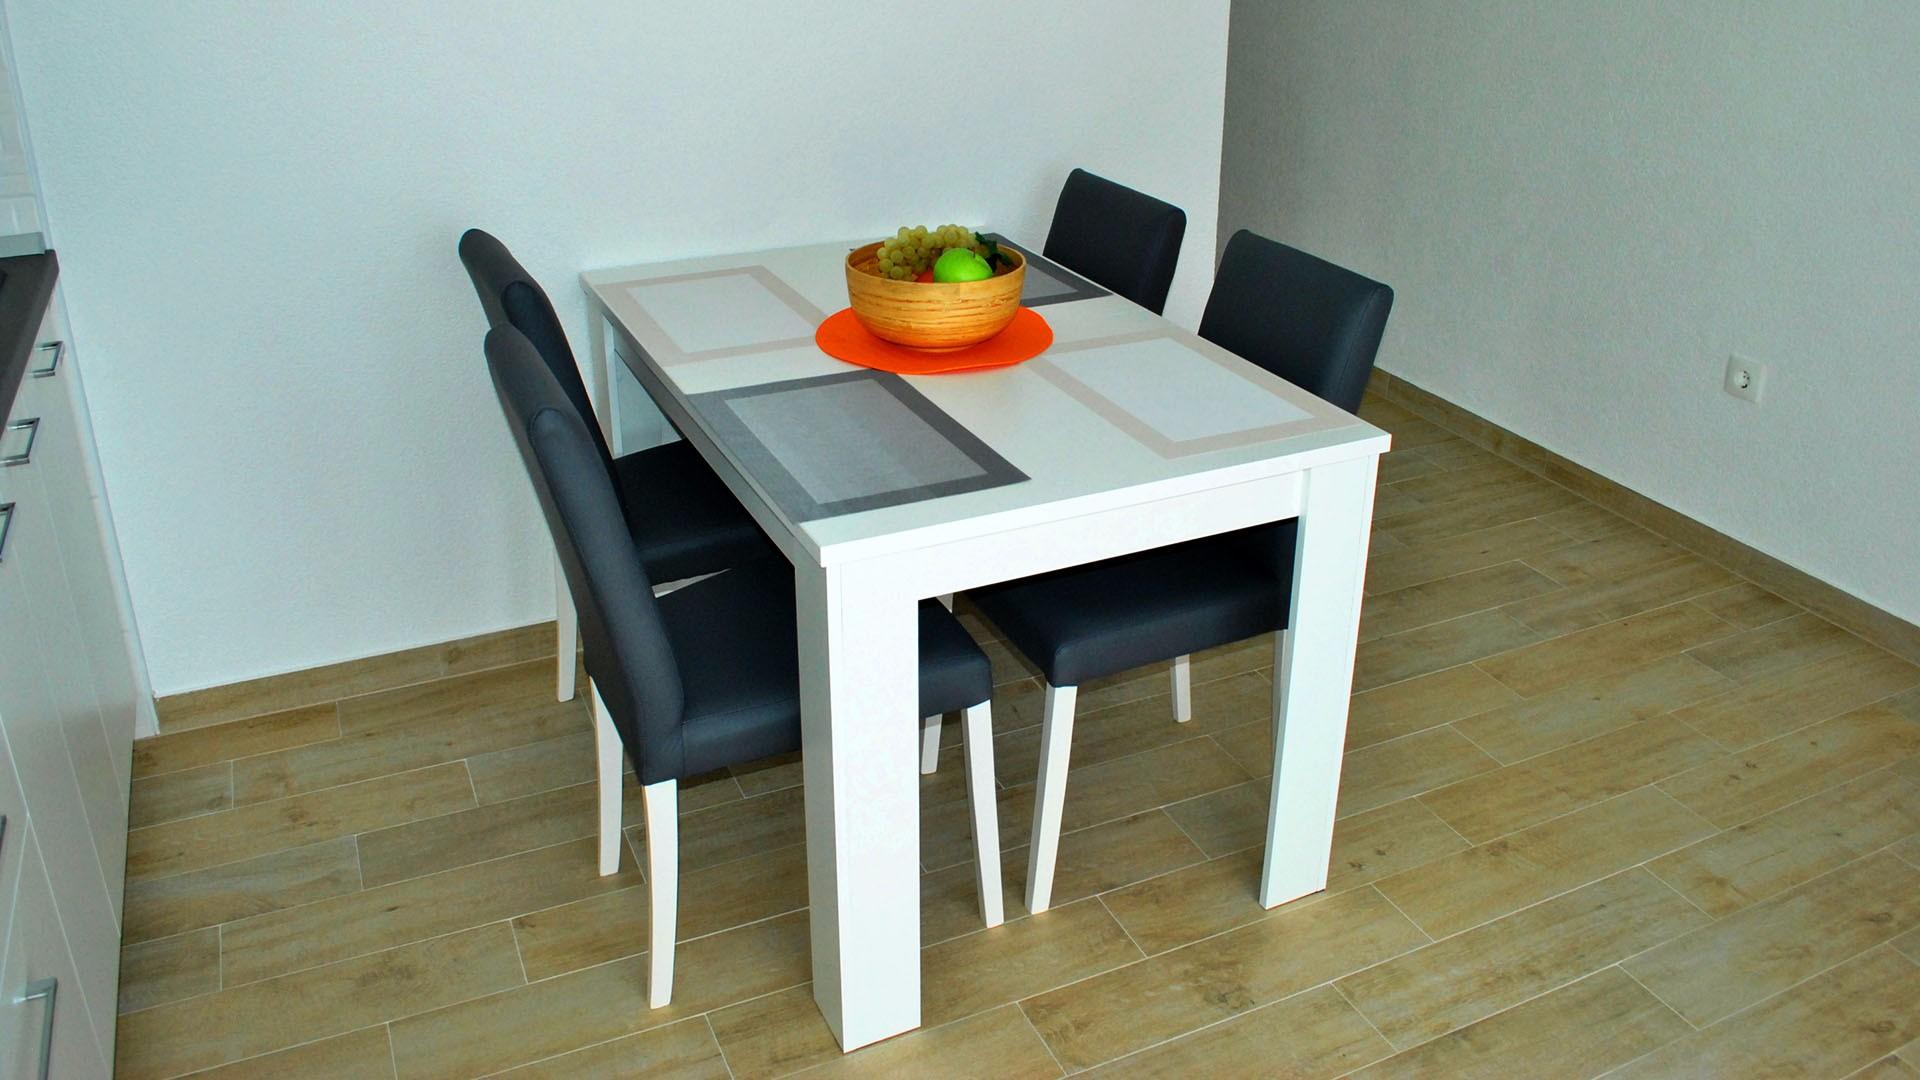 ApartmentA7 dinning table